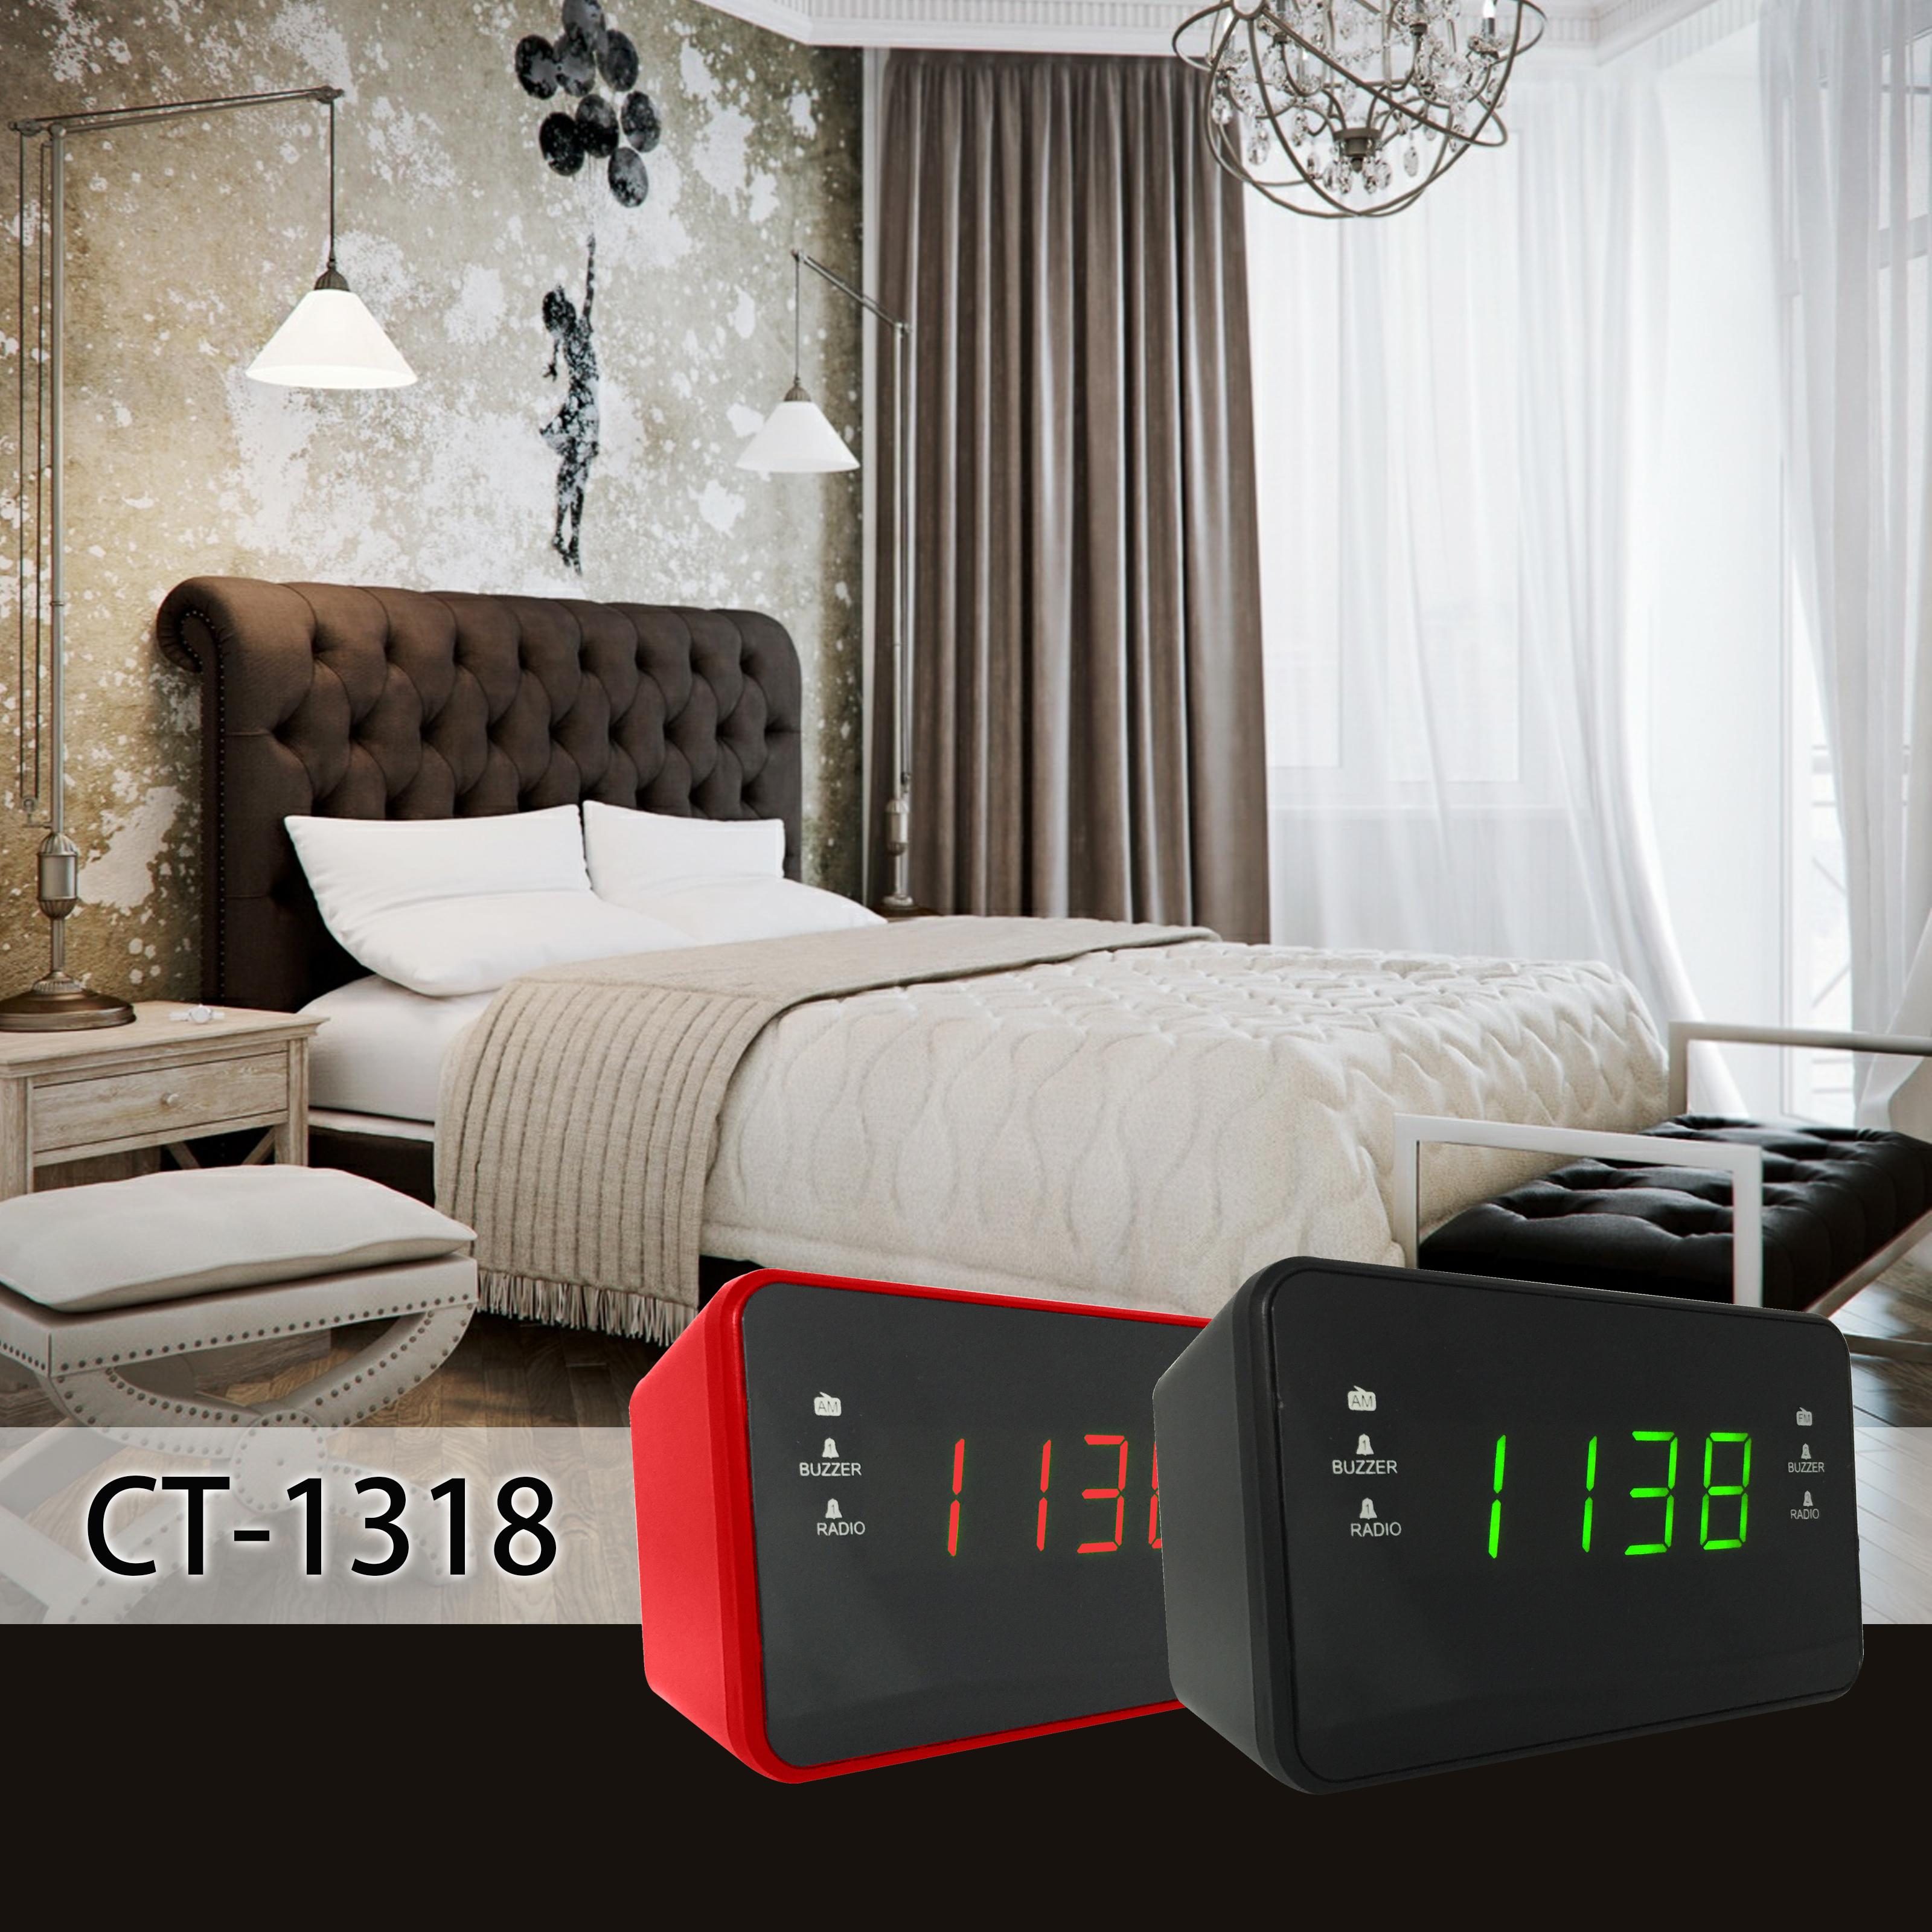 CT-1318